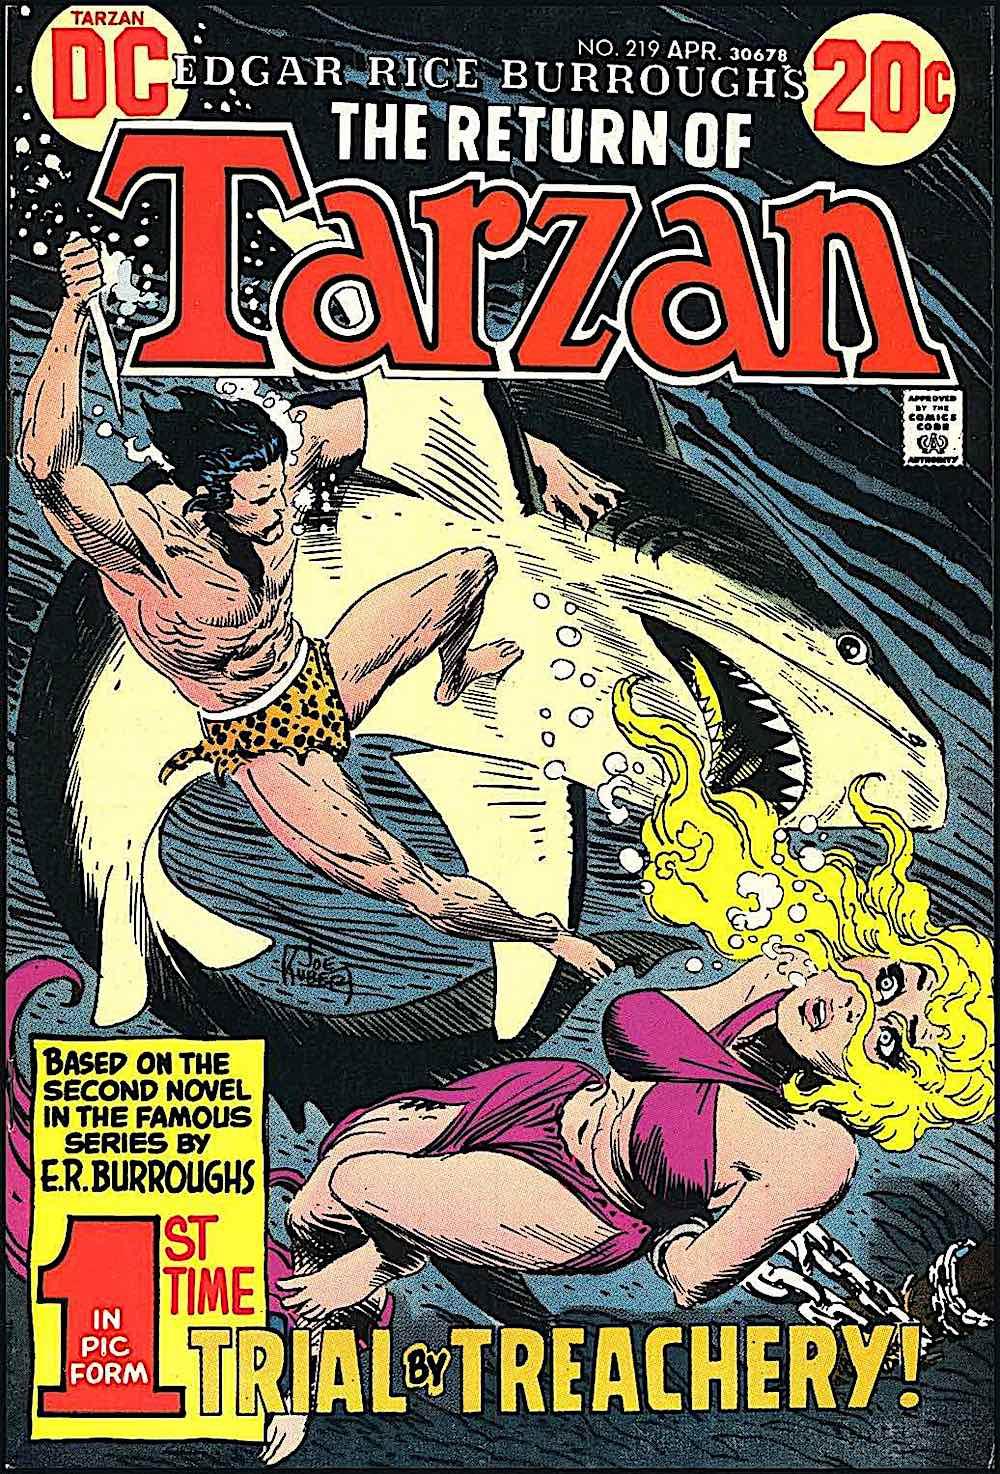 a 1973 Joe Kubert DC comic book cover for The Return Of Tarzan